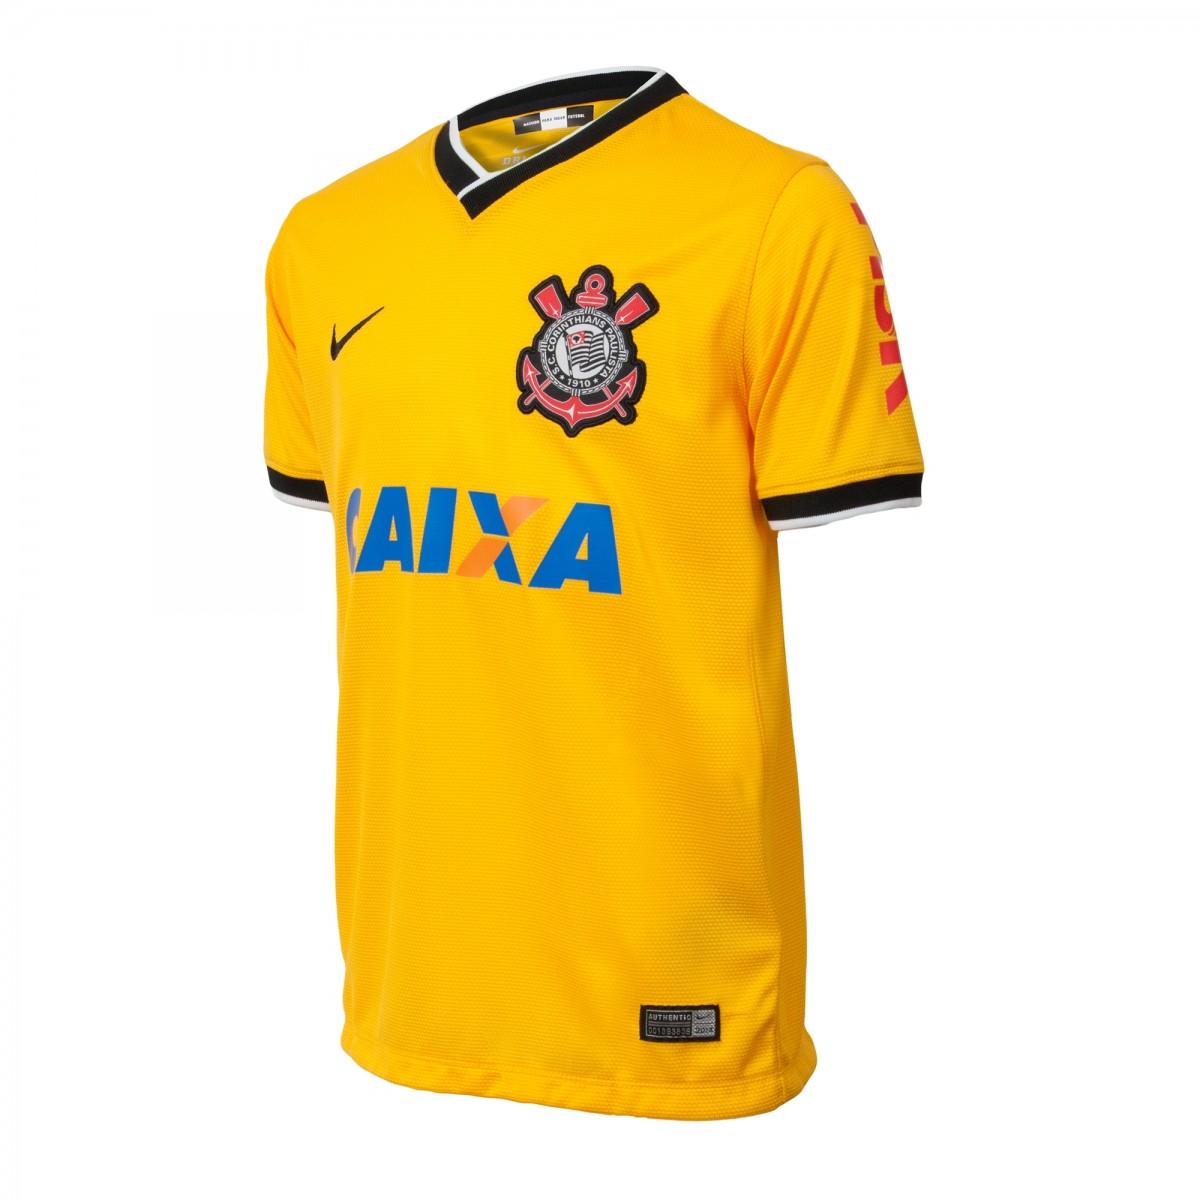 d592c458f3 Camiseta Nike Manga Infantil Curta Corinthians